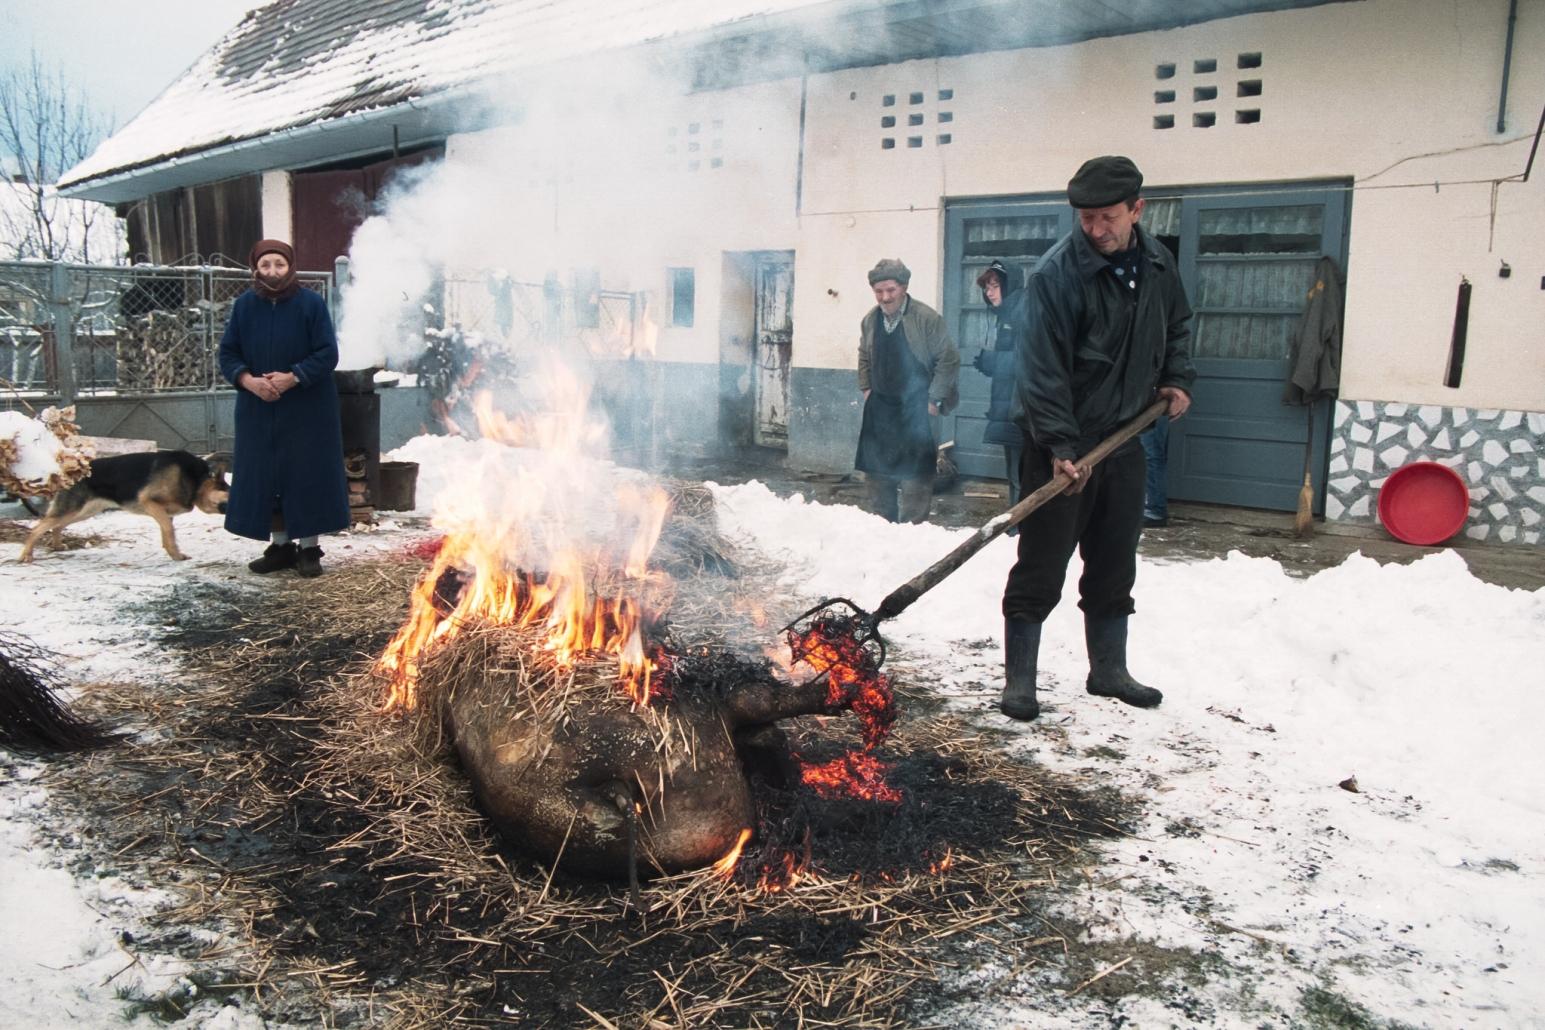 Porc de Craciun, traditional